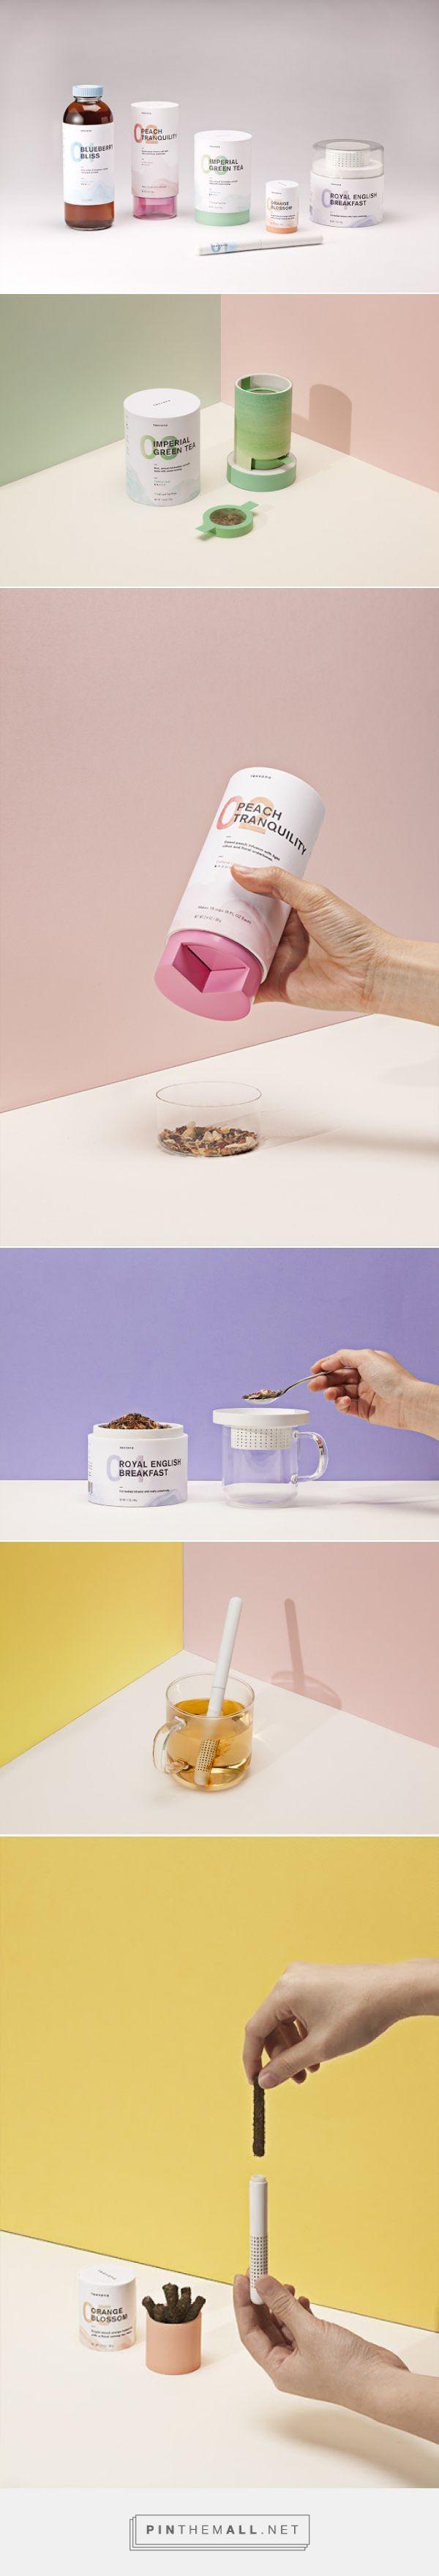 Teavana #tea #student #concept #packaging designed by Melia Tandiono - http://www.packagingoftheworld.com/2015/06/teavana-student-project.html